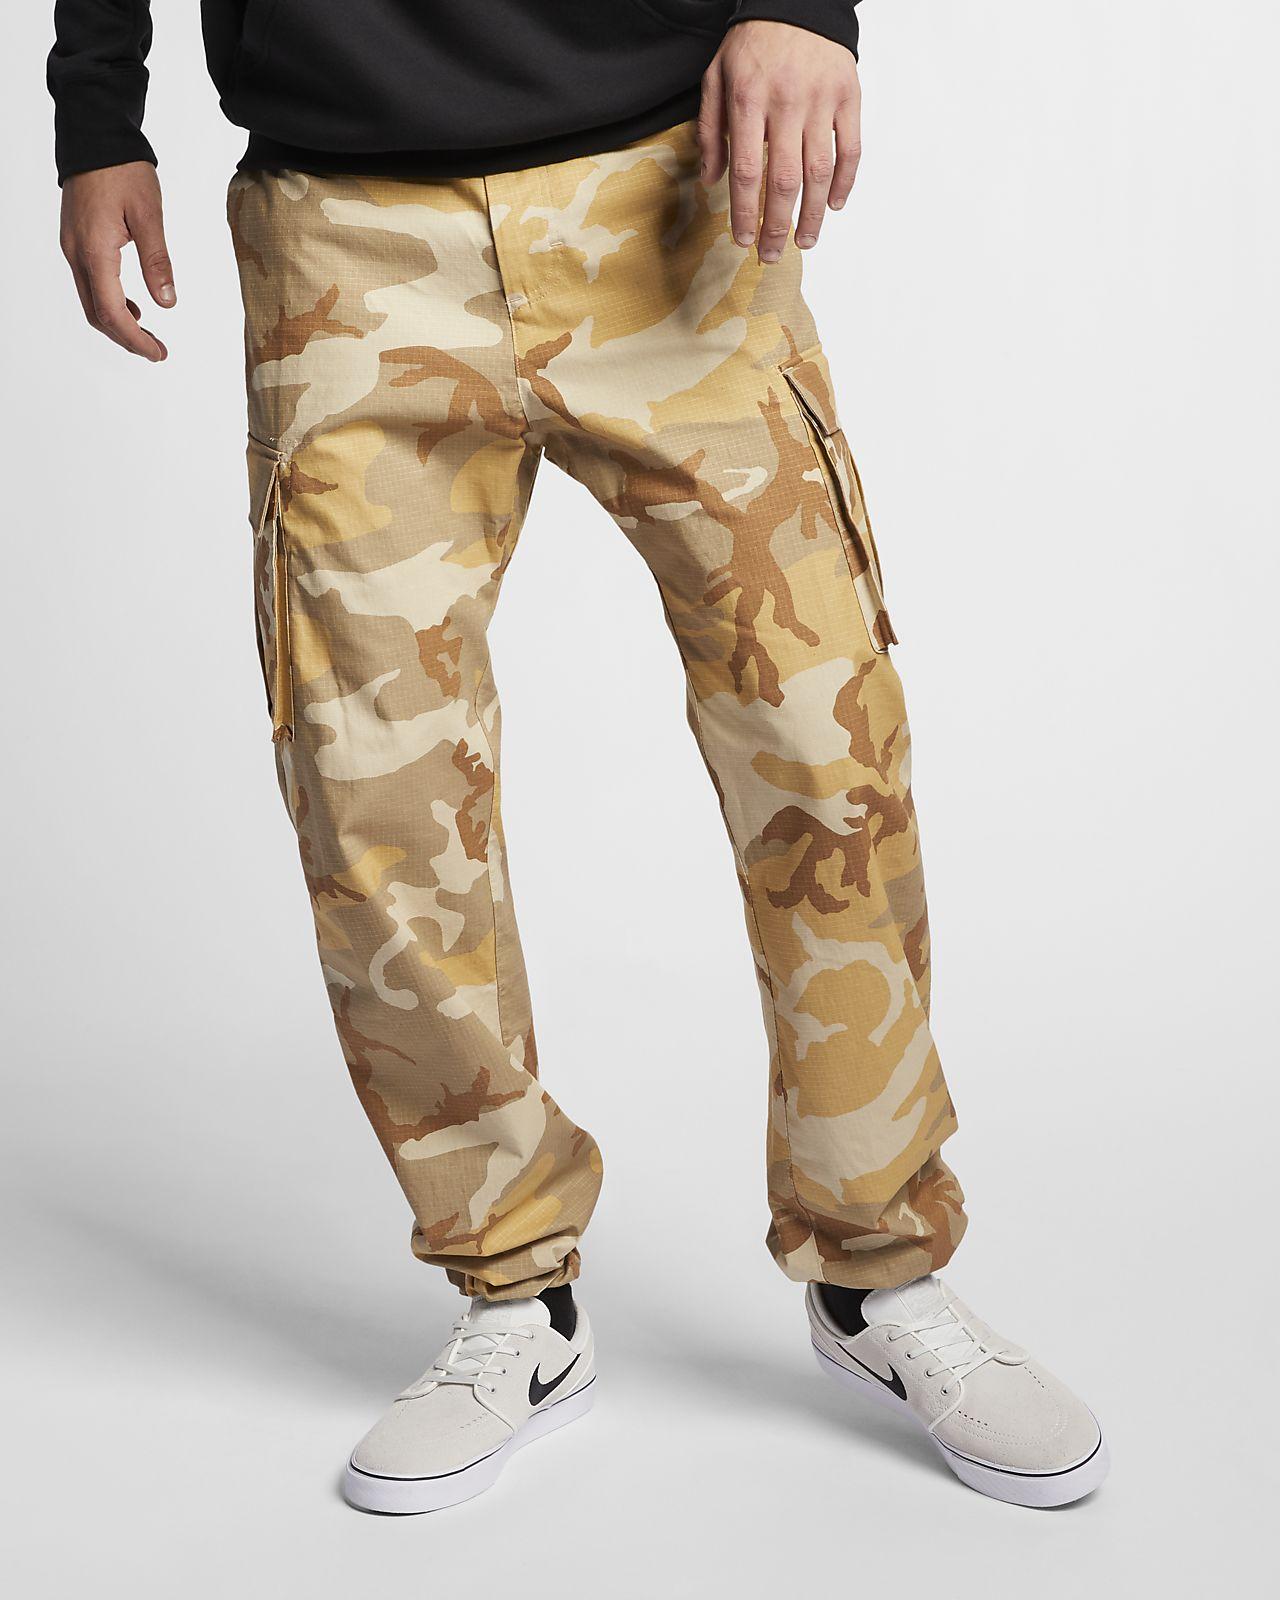 Pantalon de skateboard camouflage Nike SB Flex FTM